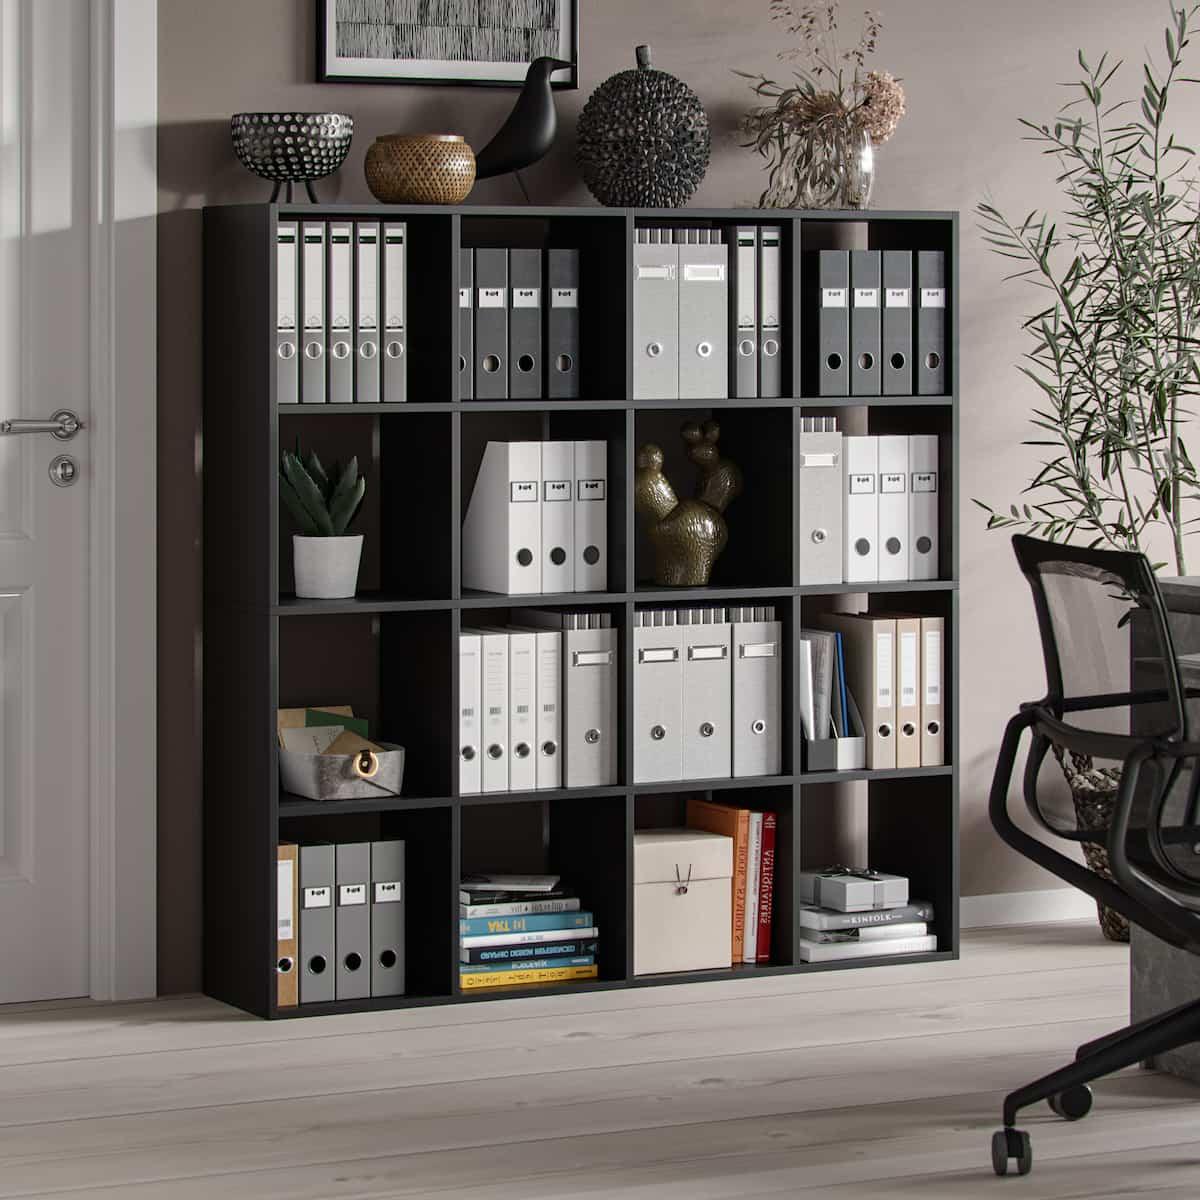 meuble bibliotheque hippocrate 138 x 138 x 30 cm 16 etageres noir